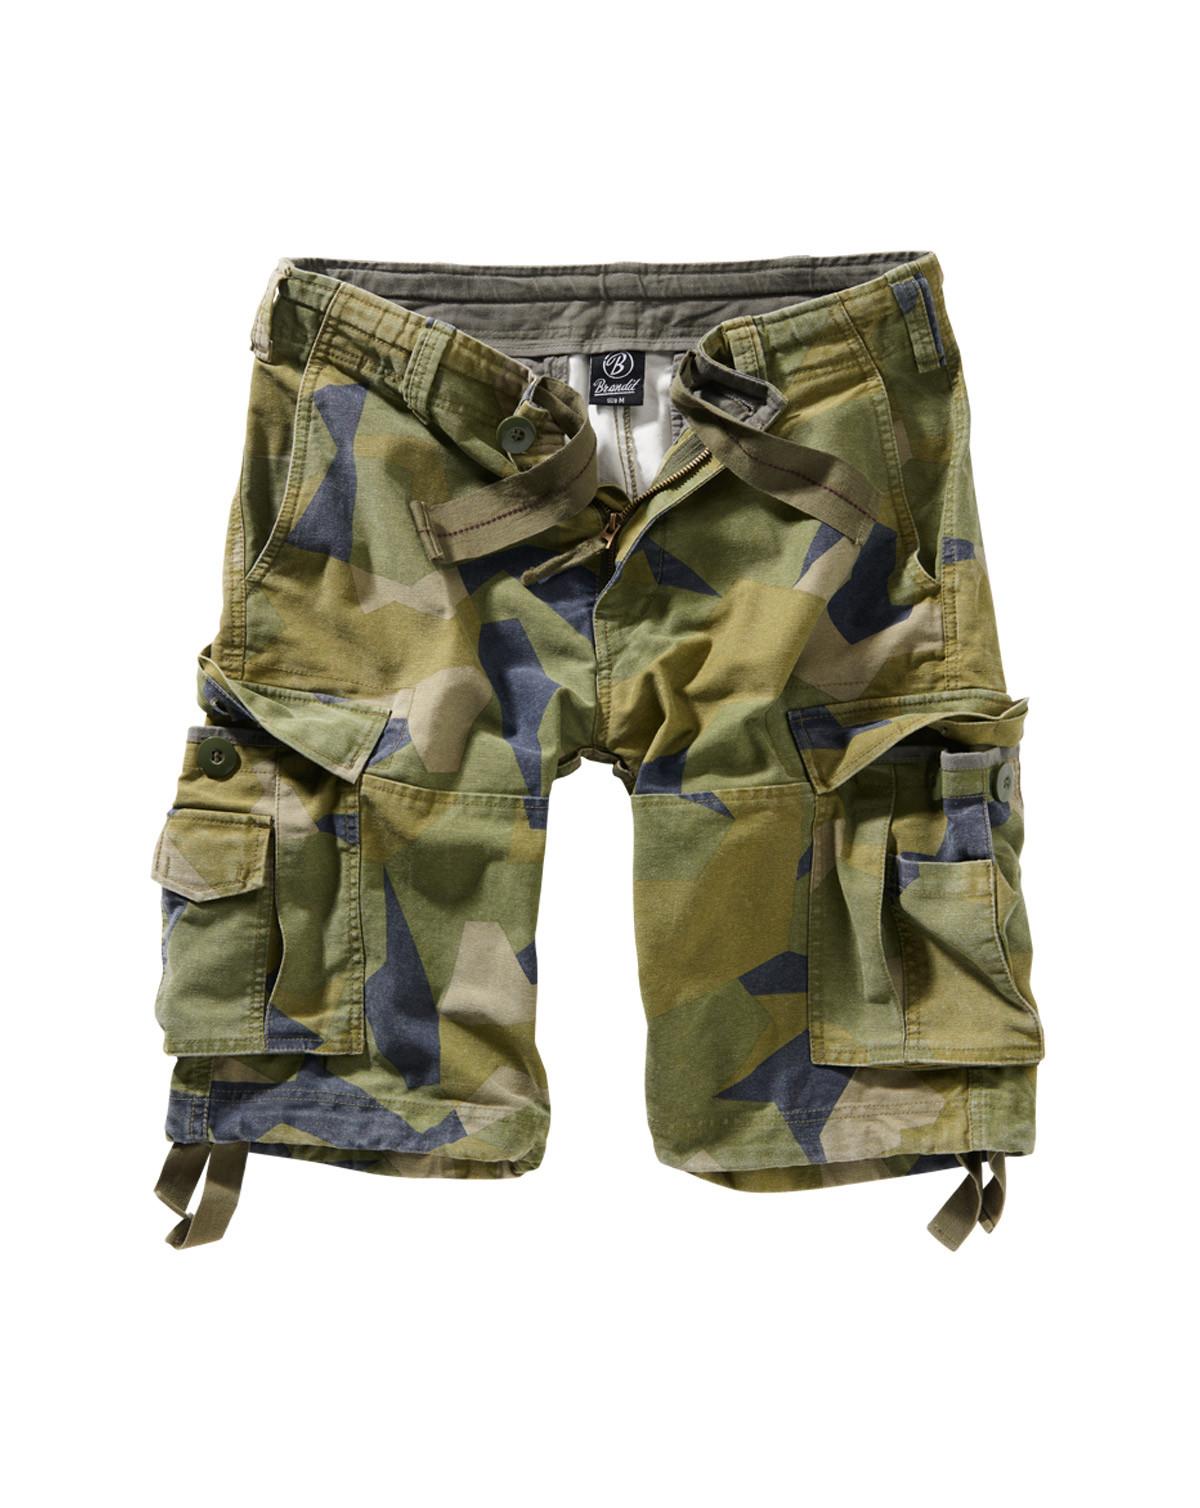 Brandit Vintage Shorts (Swedish M/90, 6XL)